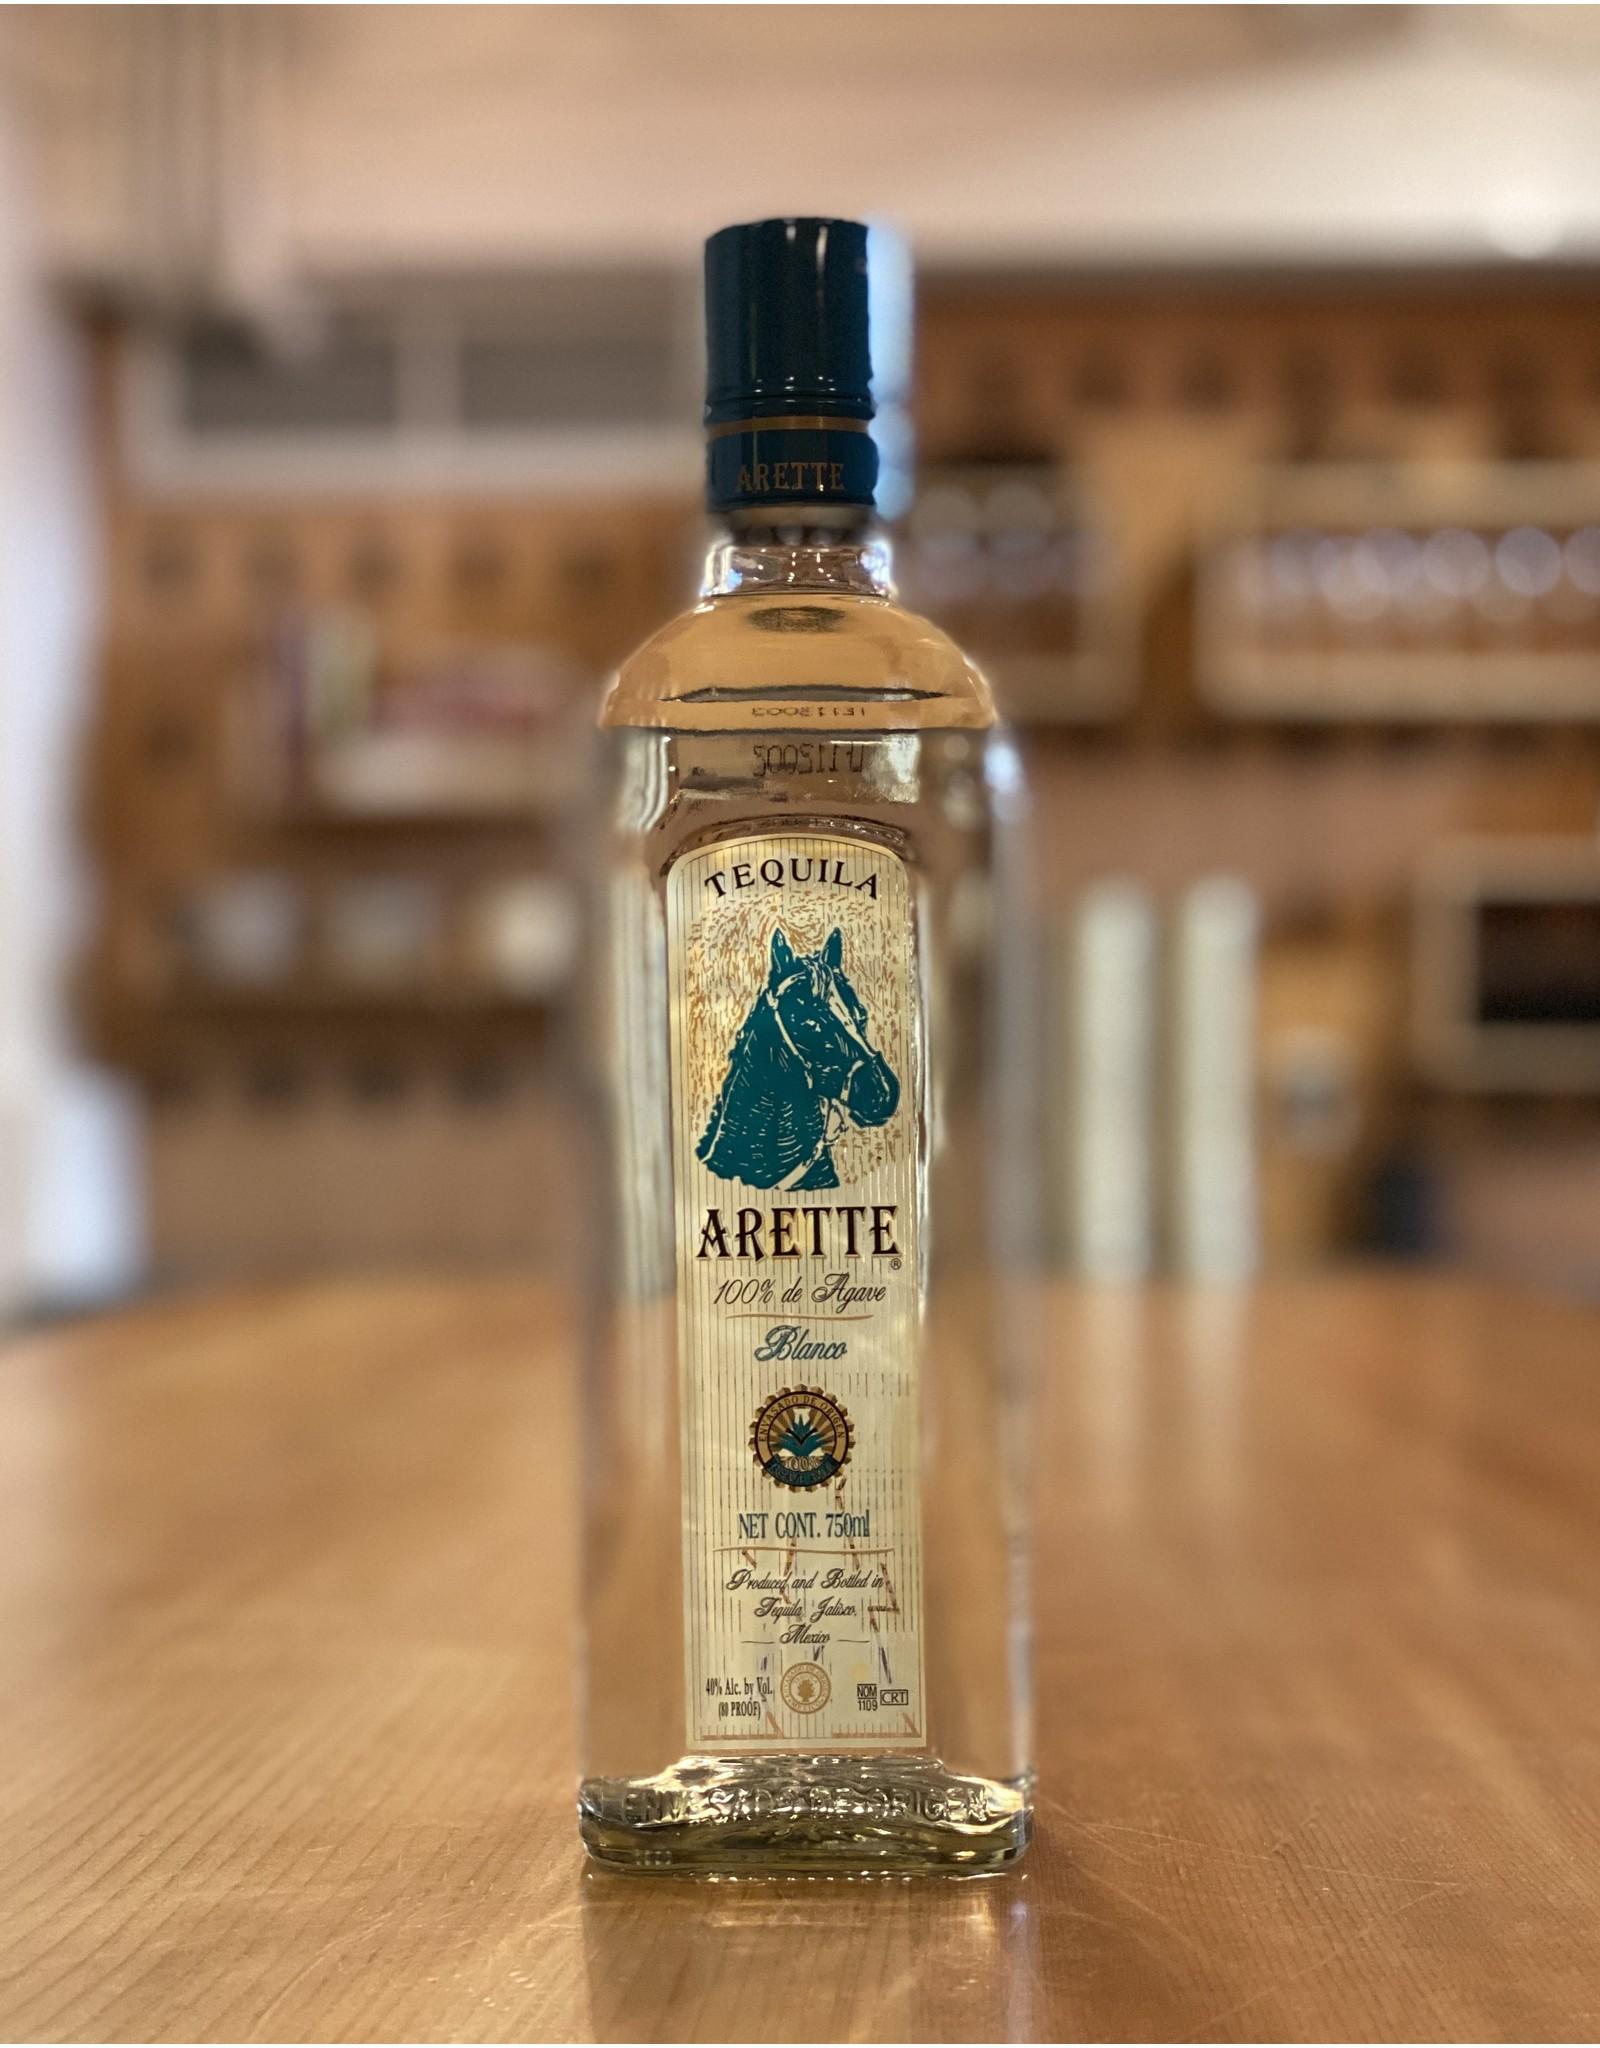 Arette Blanco Tequila 750ml - Jalisco, Mexico